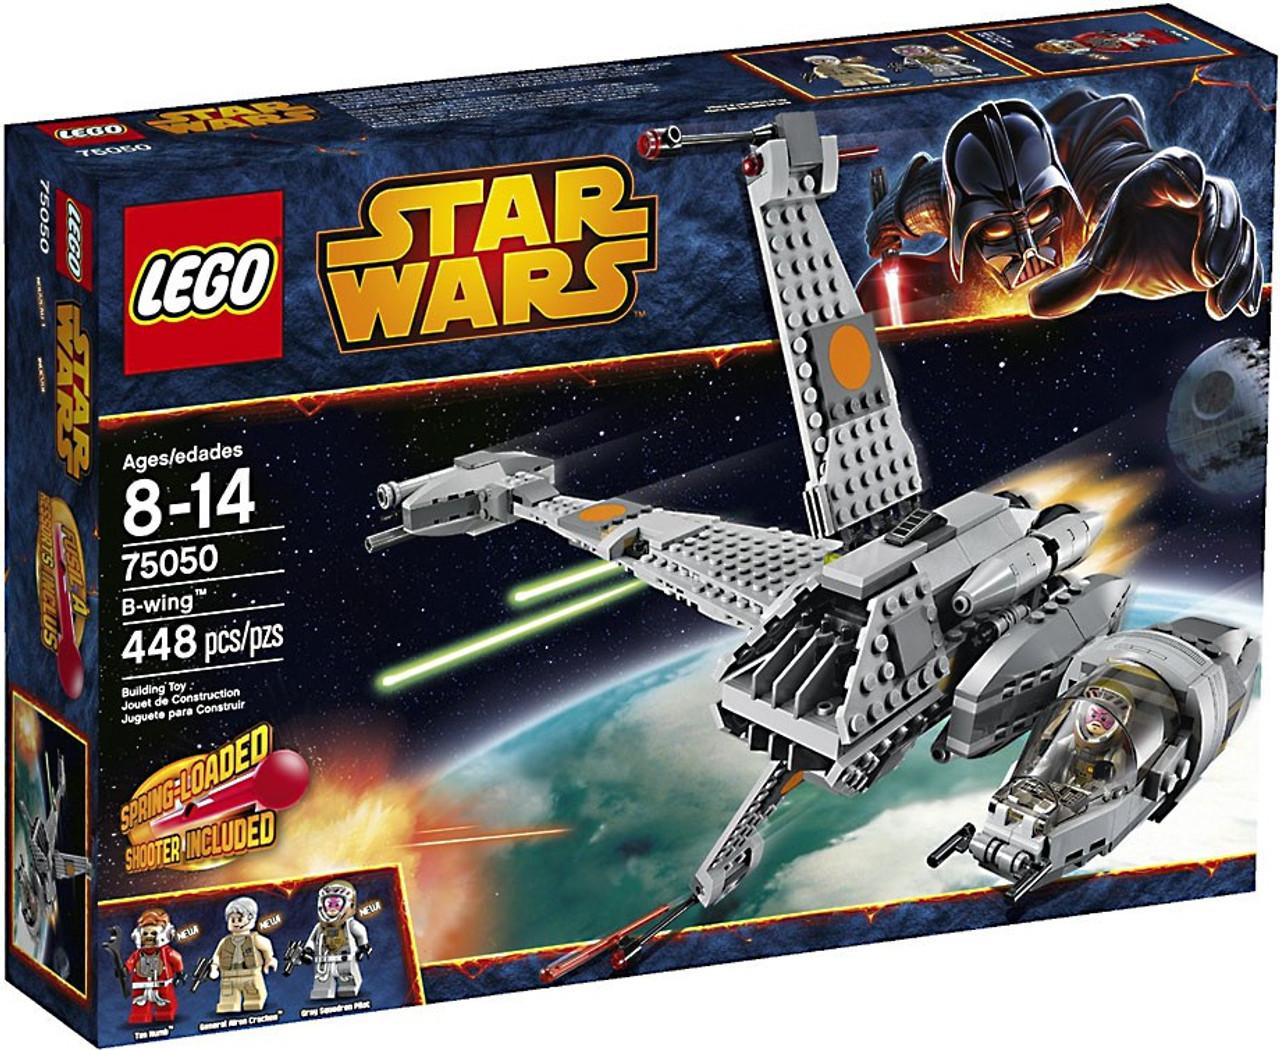 14e0bd342d98 LEGO Star Wars Return of the Jedi B-Wing Set 75050 - ToyWiz